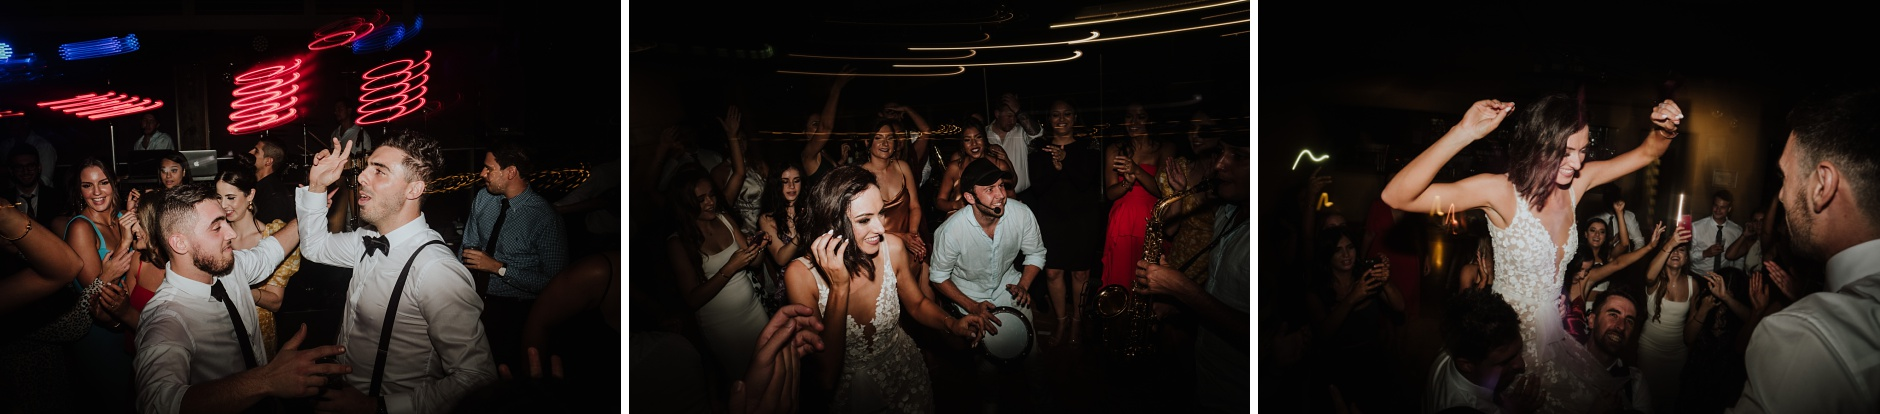 Sydney-Wedding-Photographer_0181.jpg